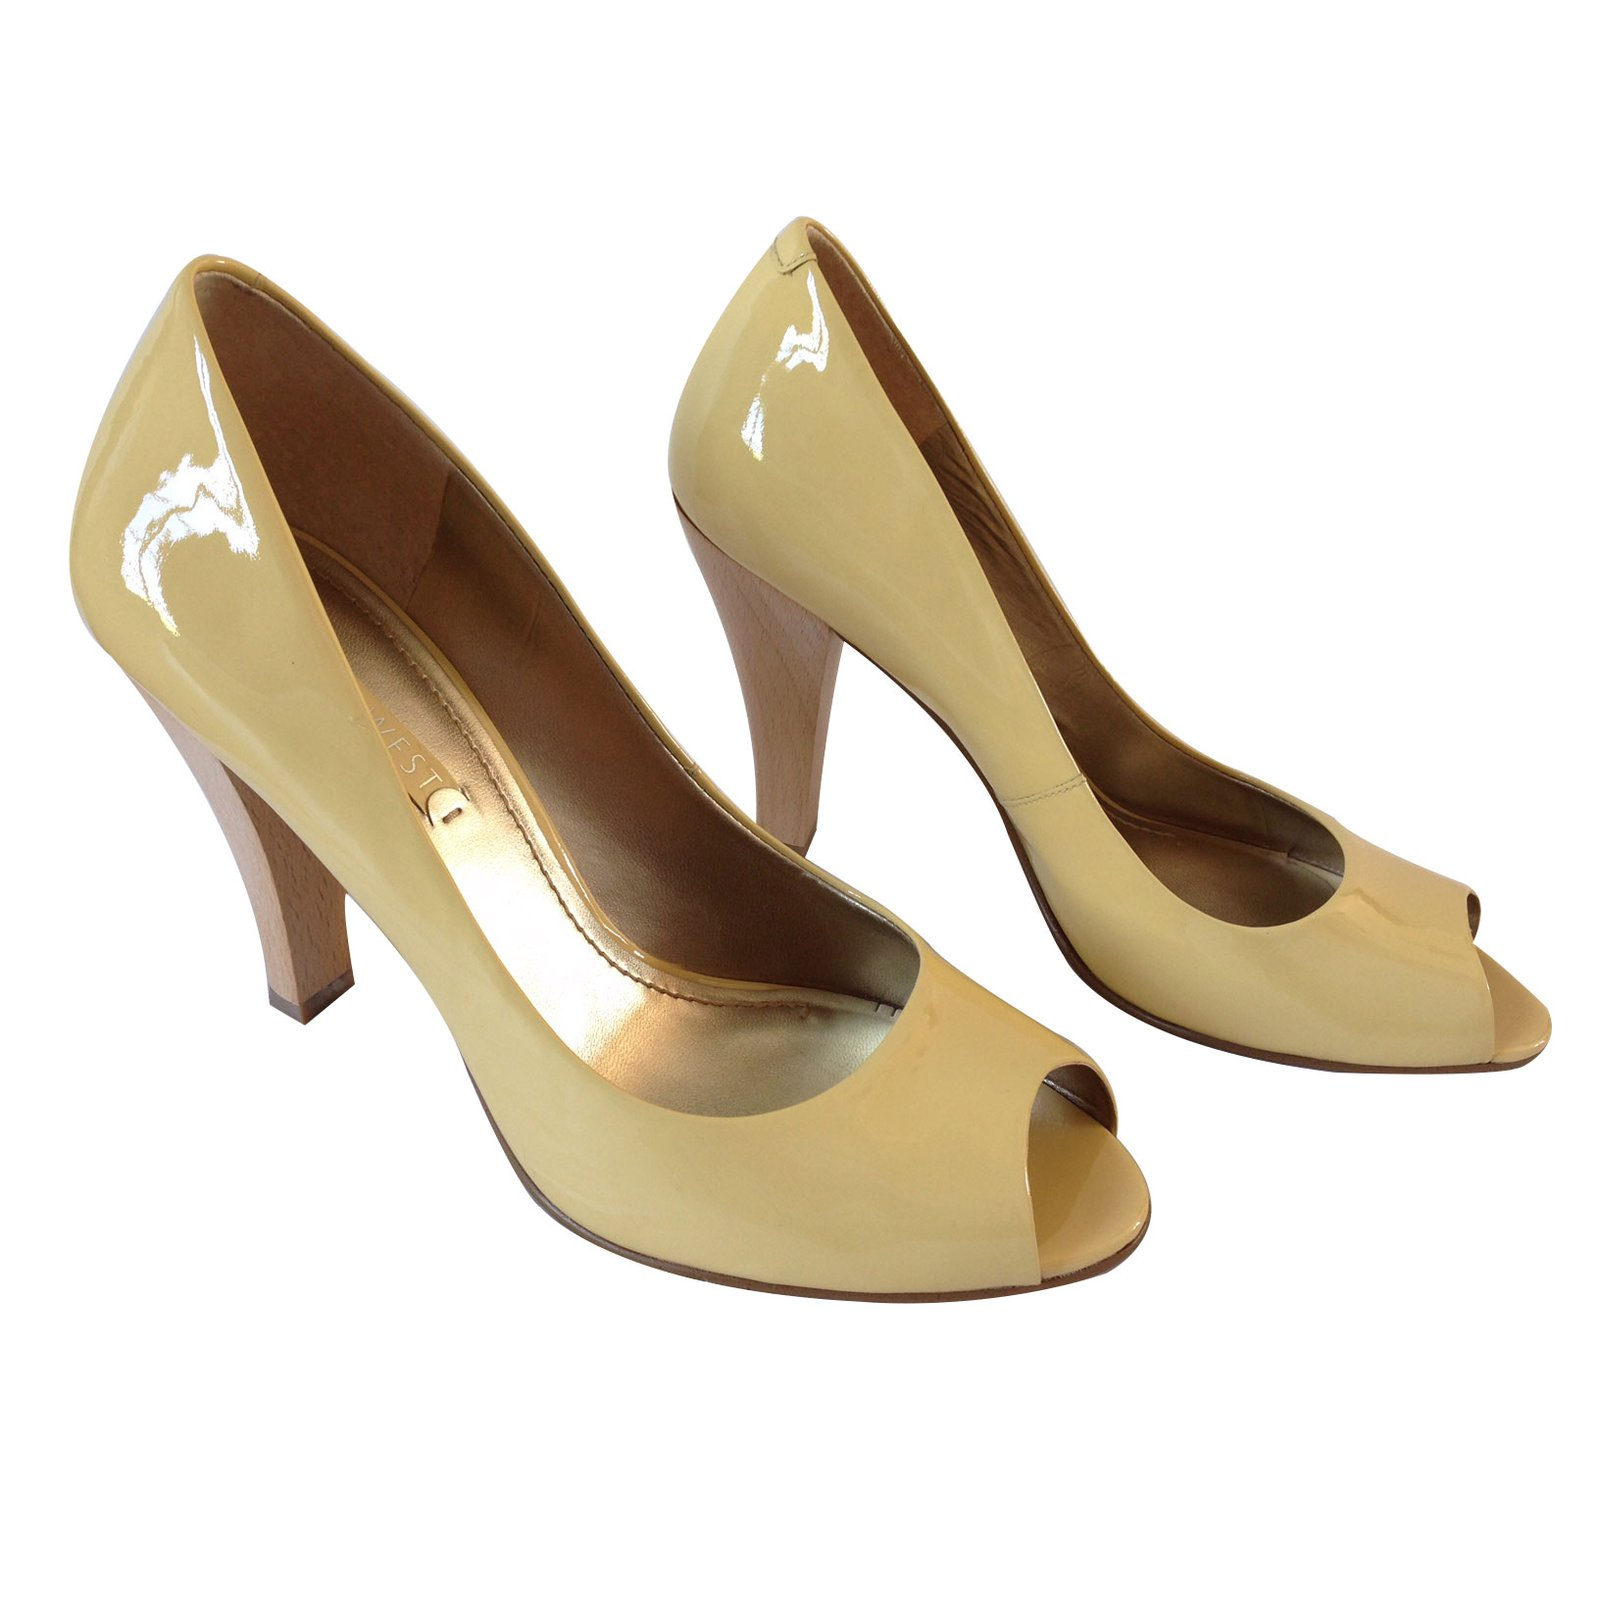 0bd6ad310a Nine West Heels Heels Patent leather Yellow ref.10462 - Joli Closet